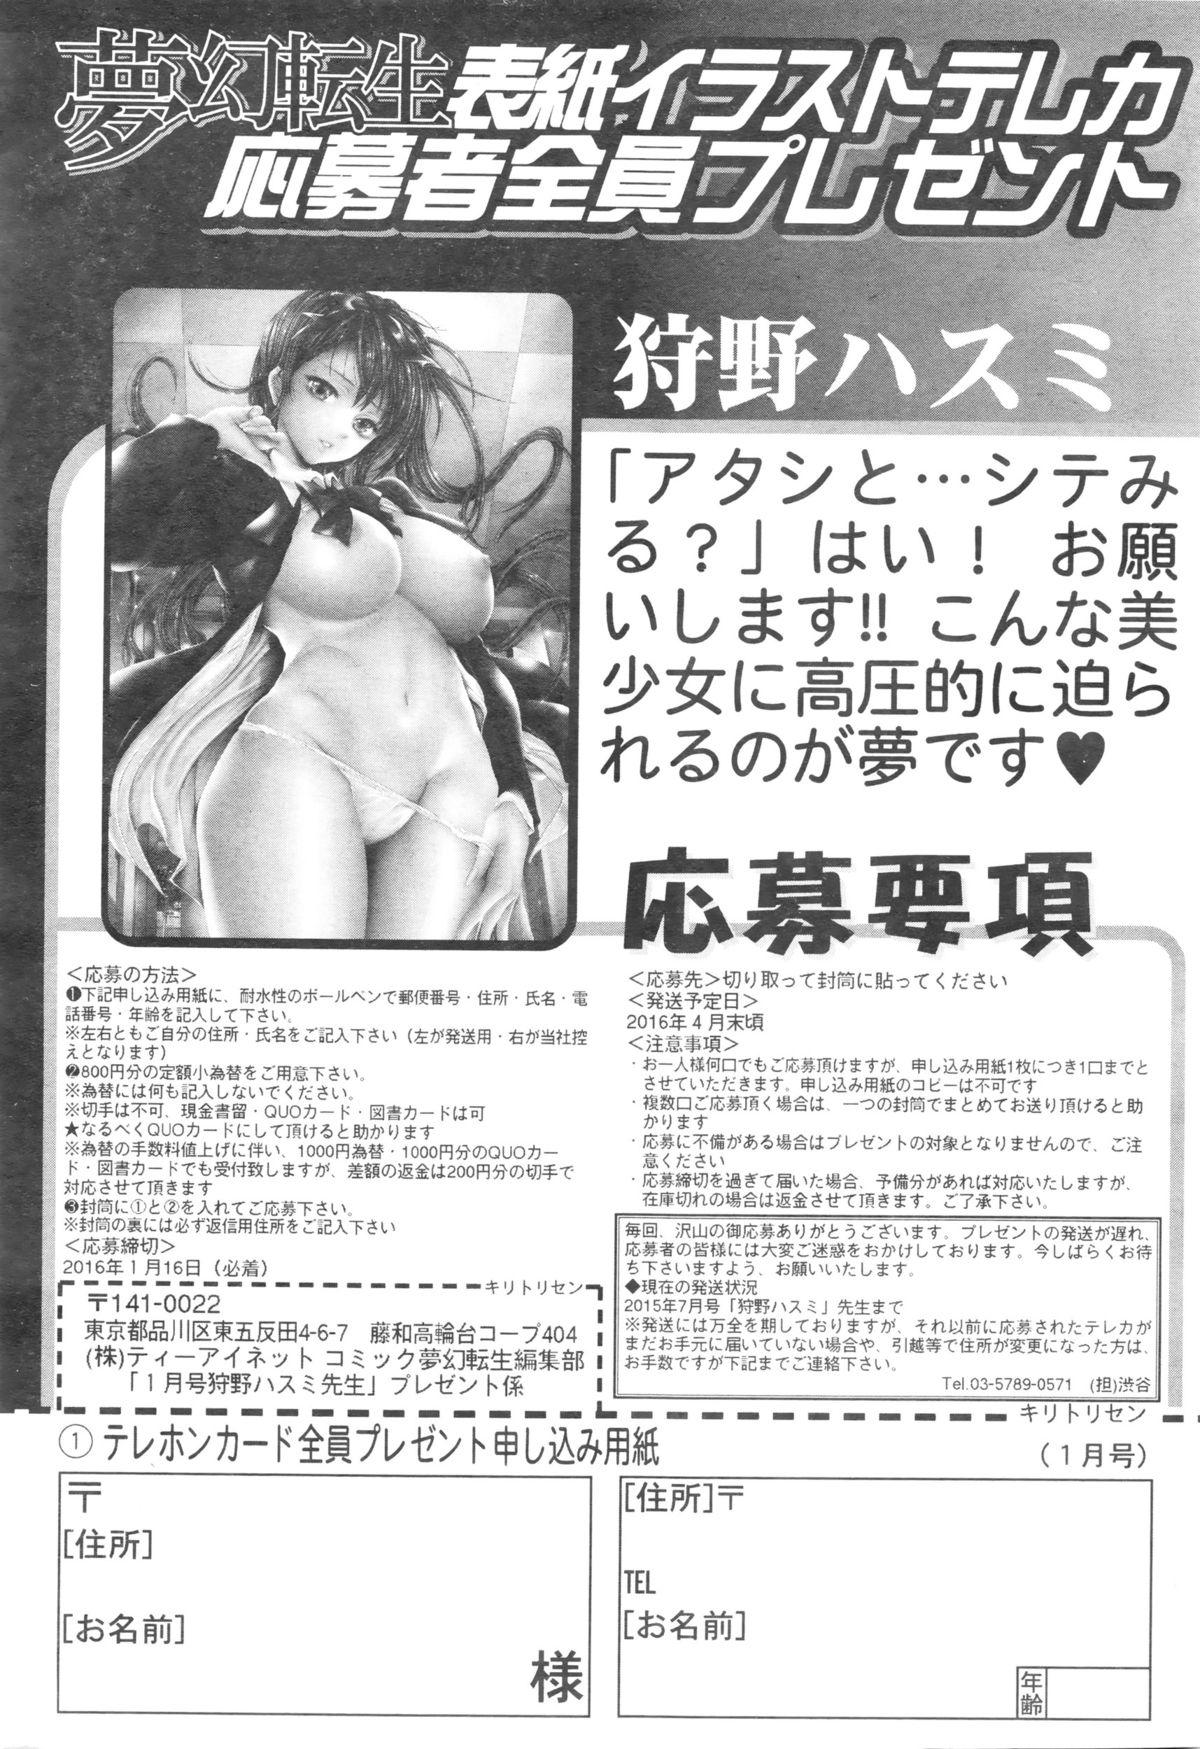 COMIC Mugen Tensei 2016-01 594